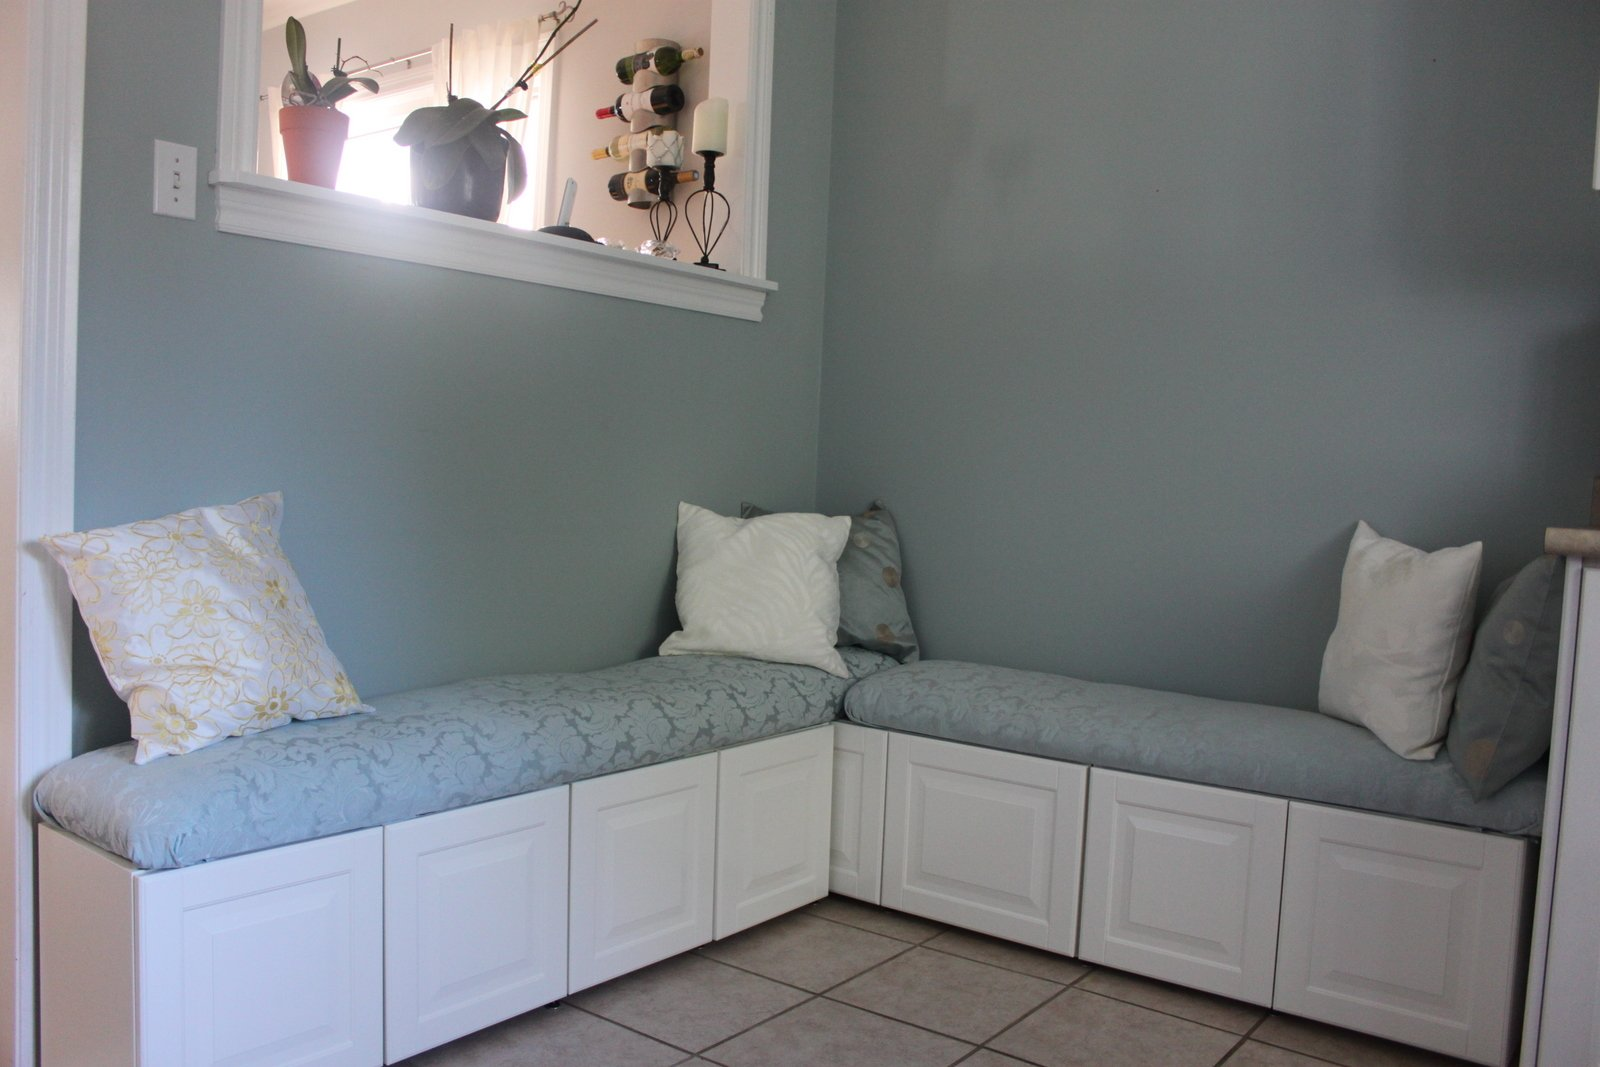 diy ikea hack banquette from lidingo cabinets banquette. Black Bedroom Furniture Sets. Home Design Ideas